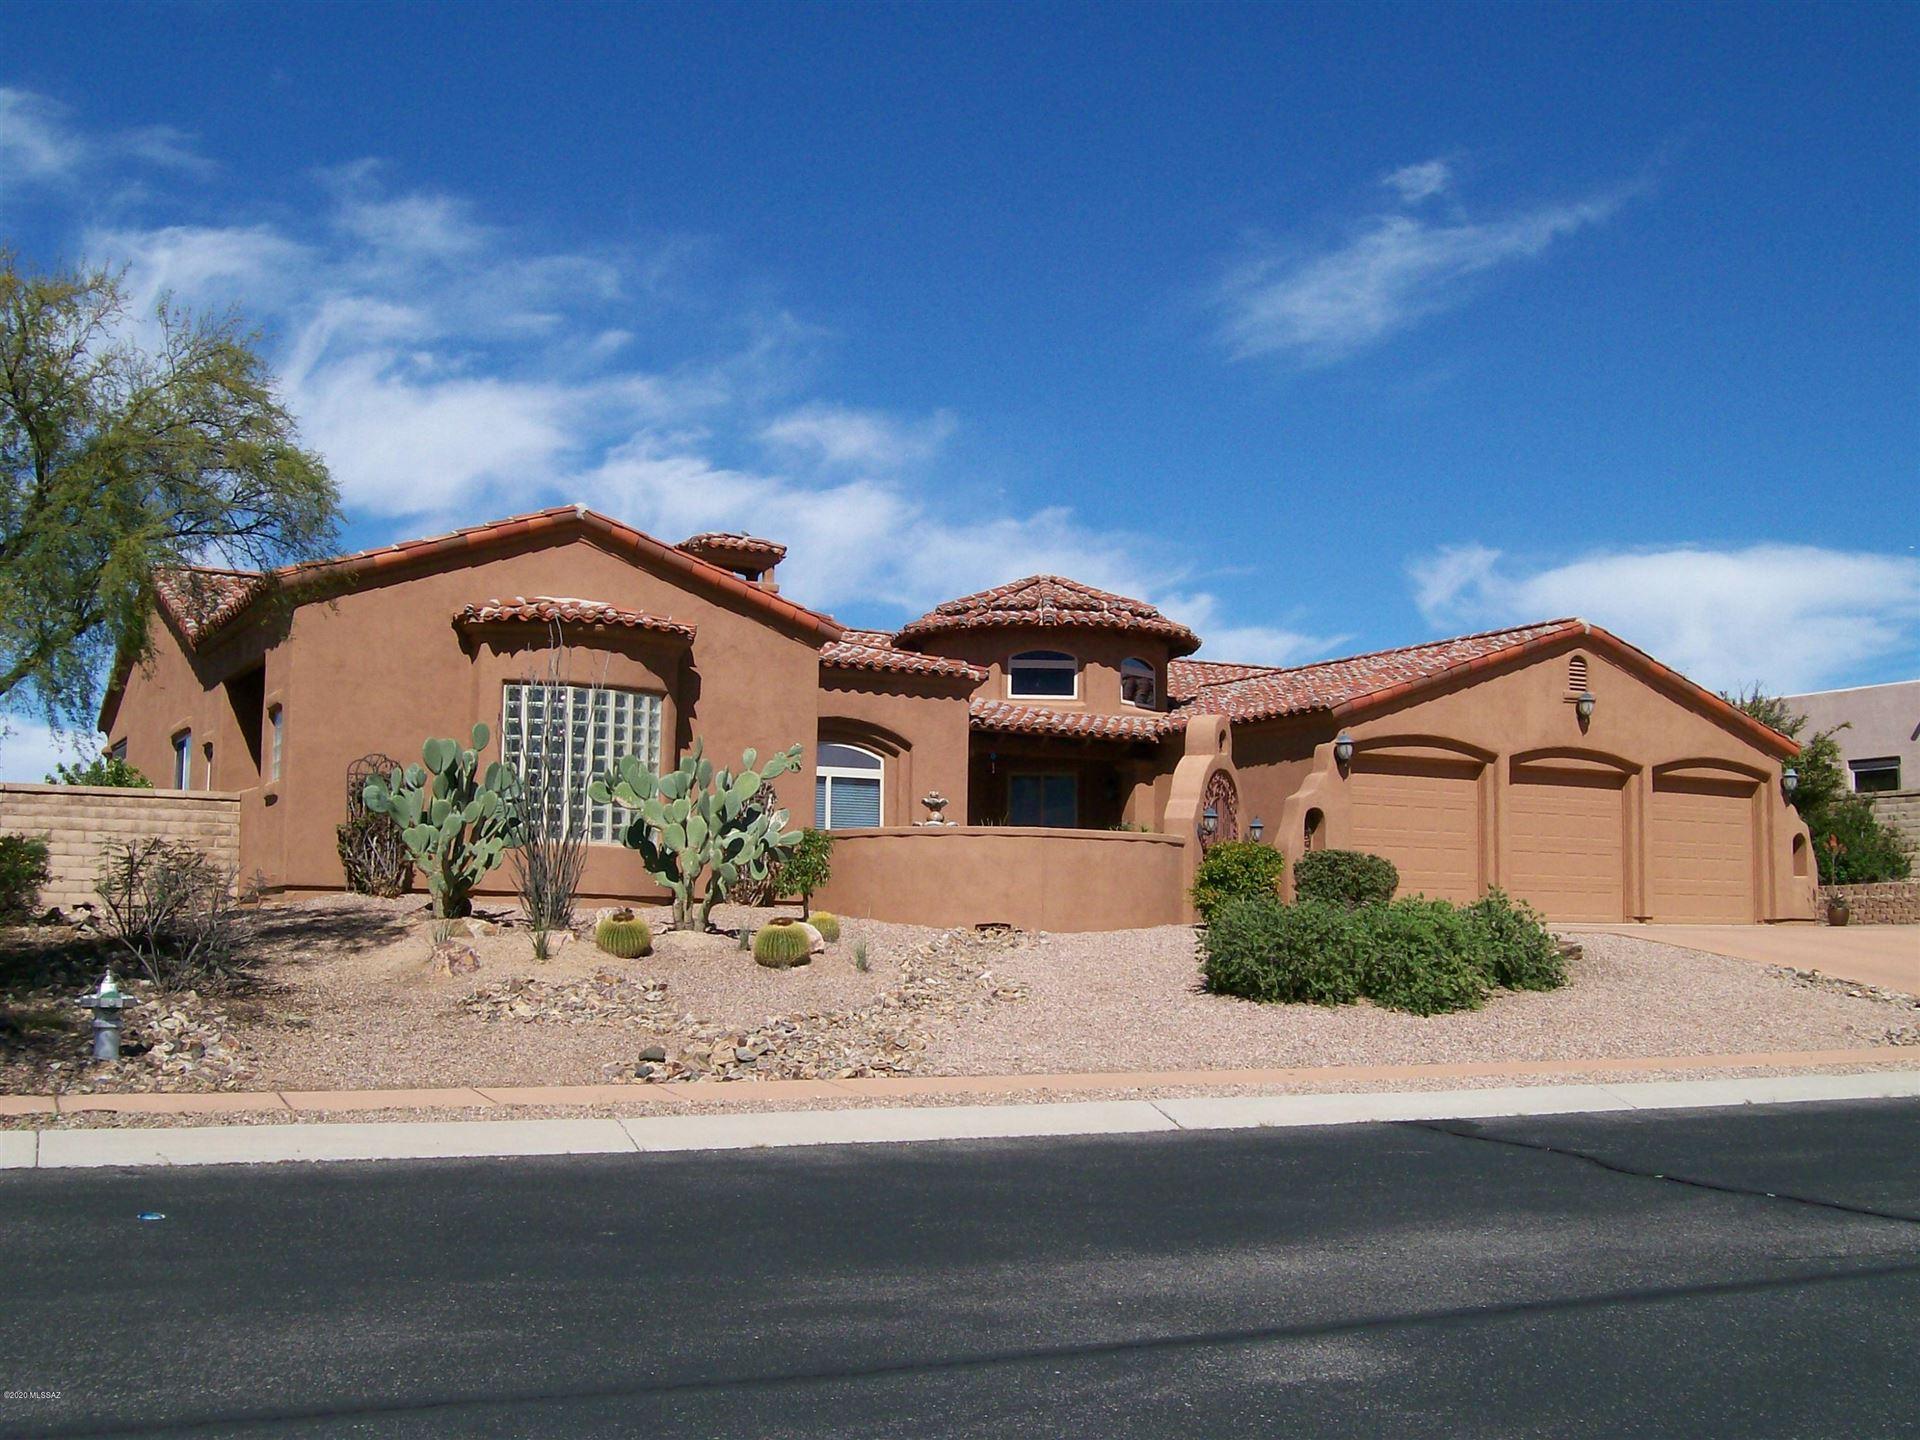 22 W Desert Knoll Place, Oro Valley, AZ 85737 - MLS#: 22012338